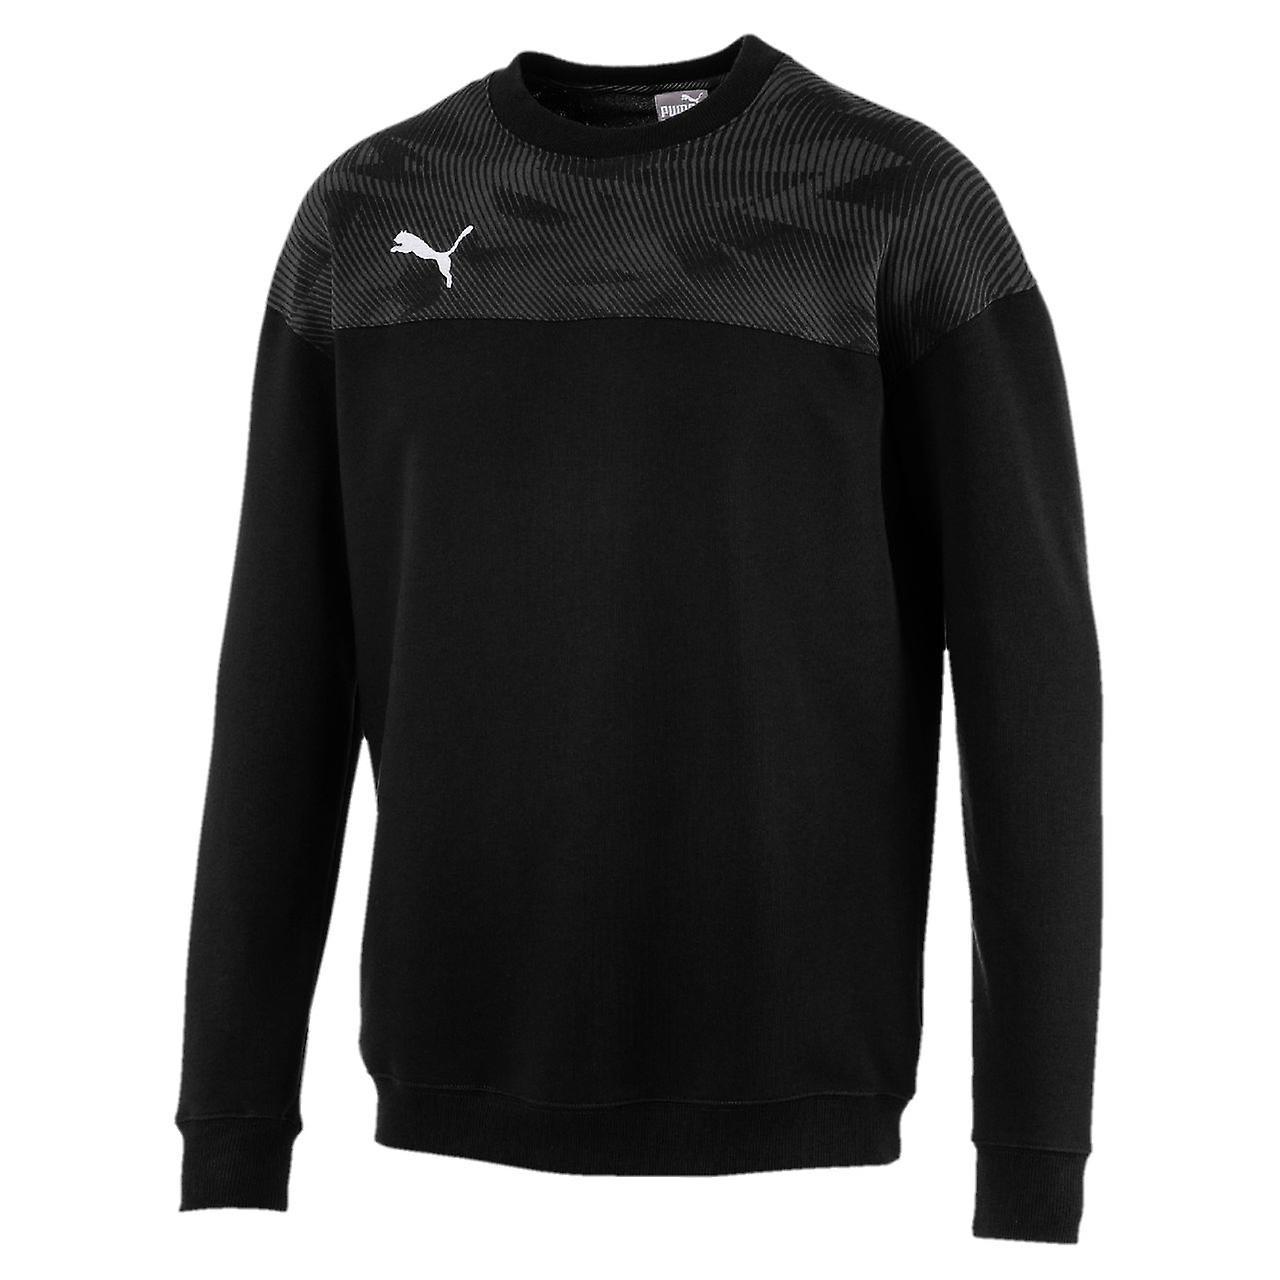 cff9f0f48216 Training Wear – PUMA Teamwear